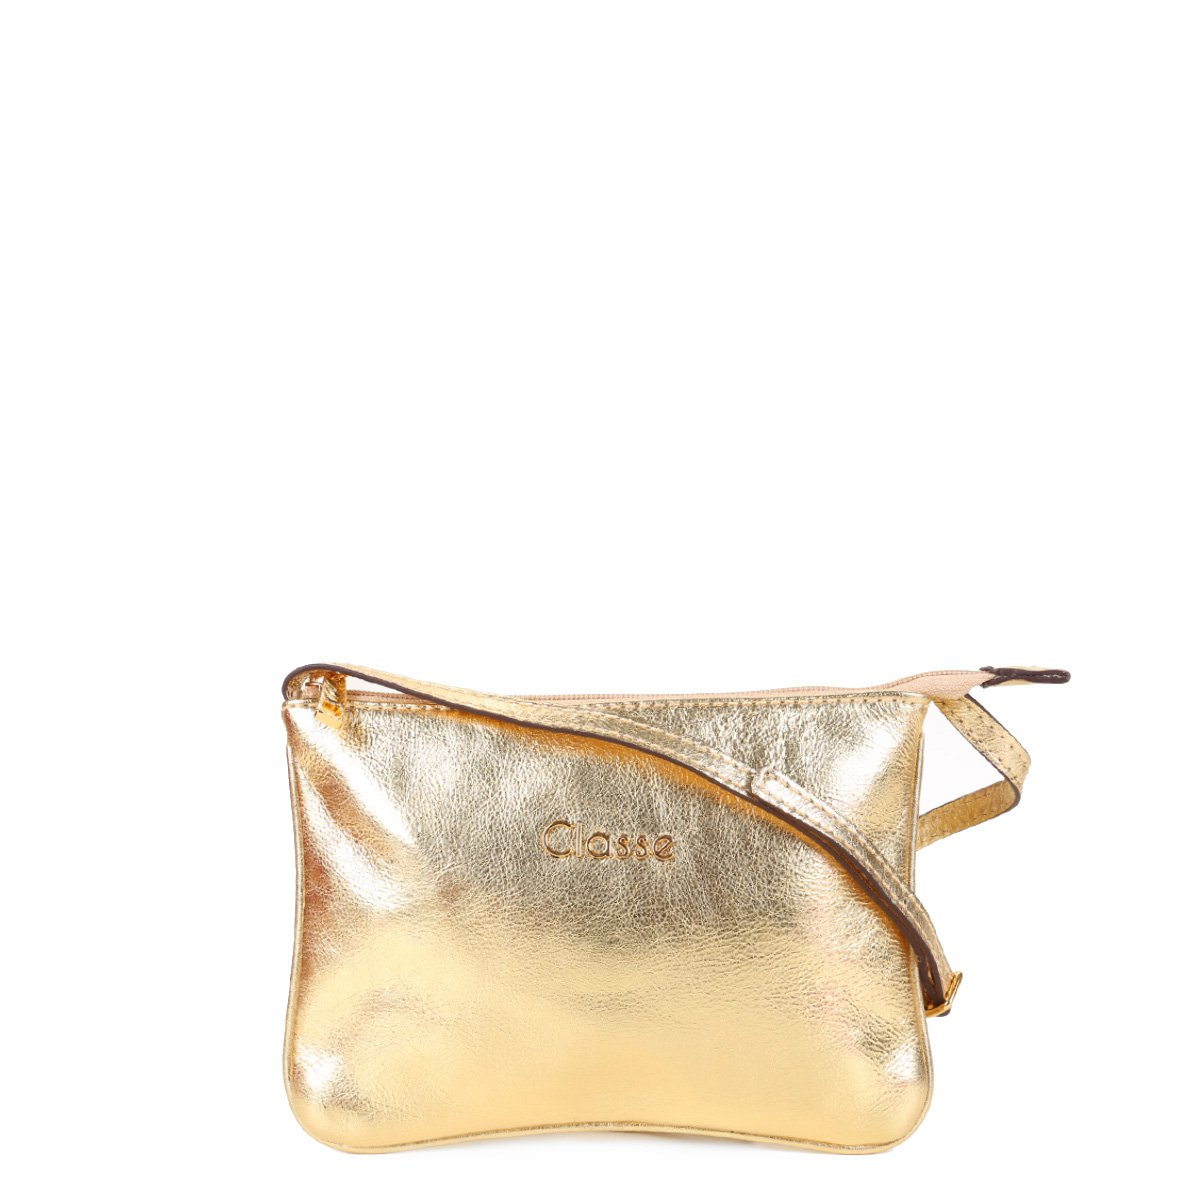 Bolsa Couro Classe Couro Mini Bag Tiracolo Pelo Feminina